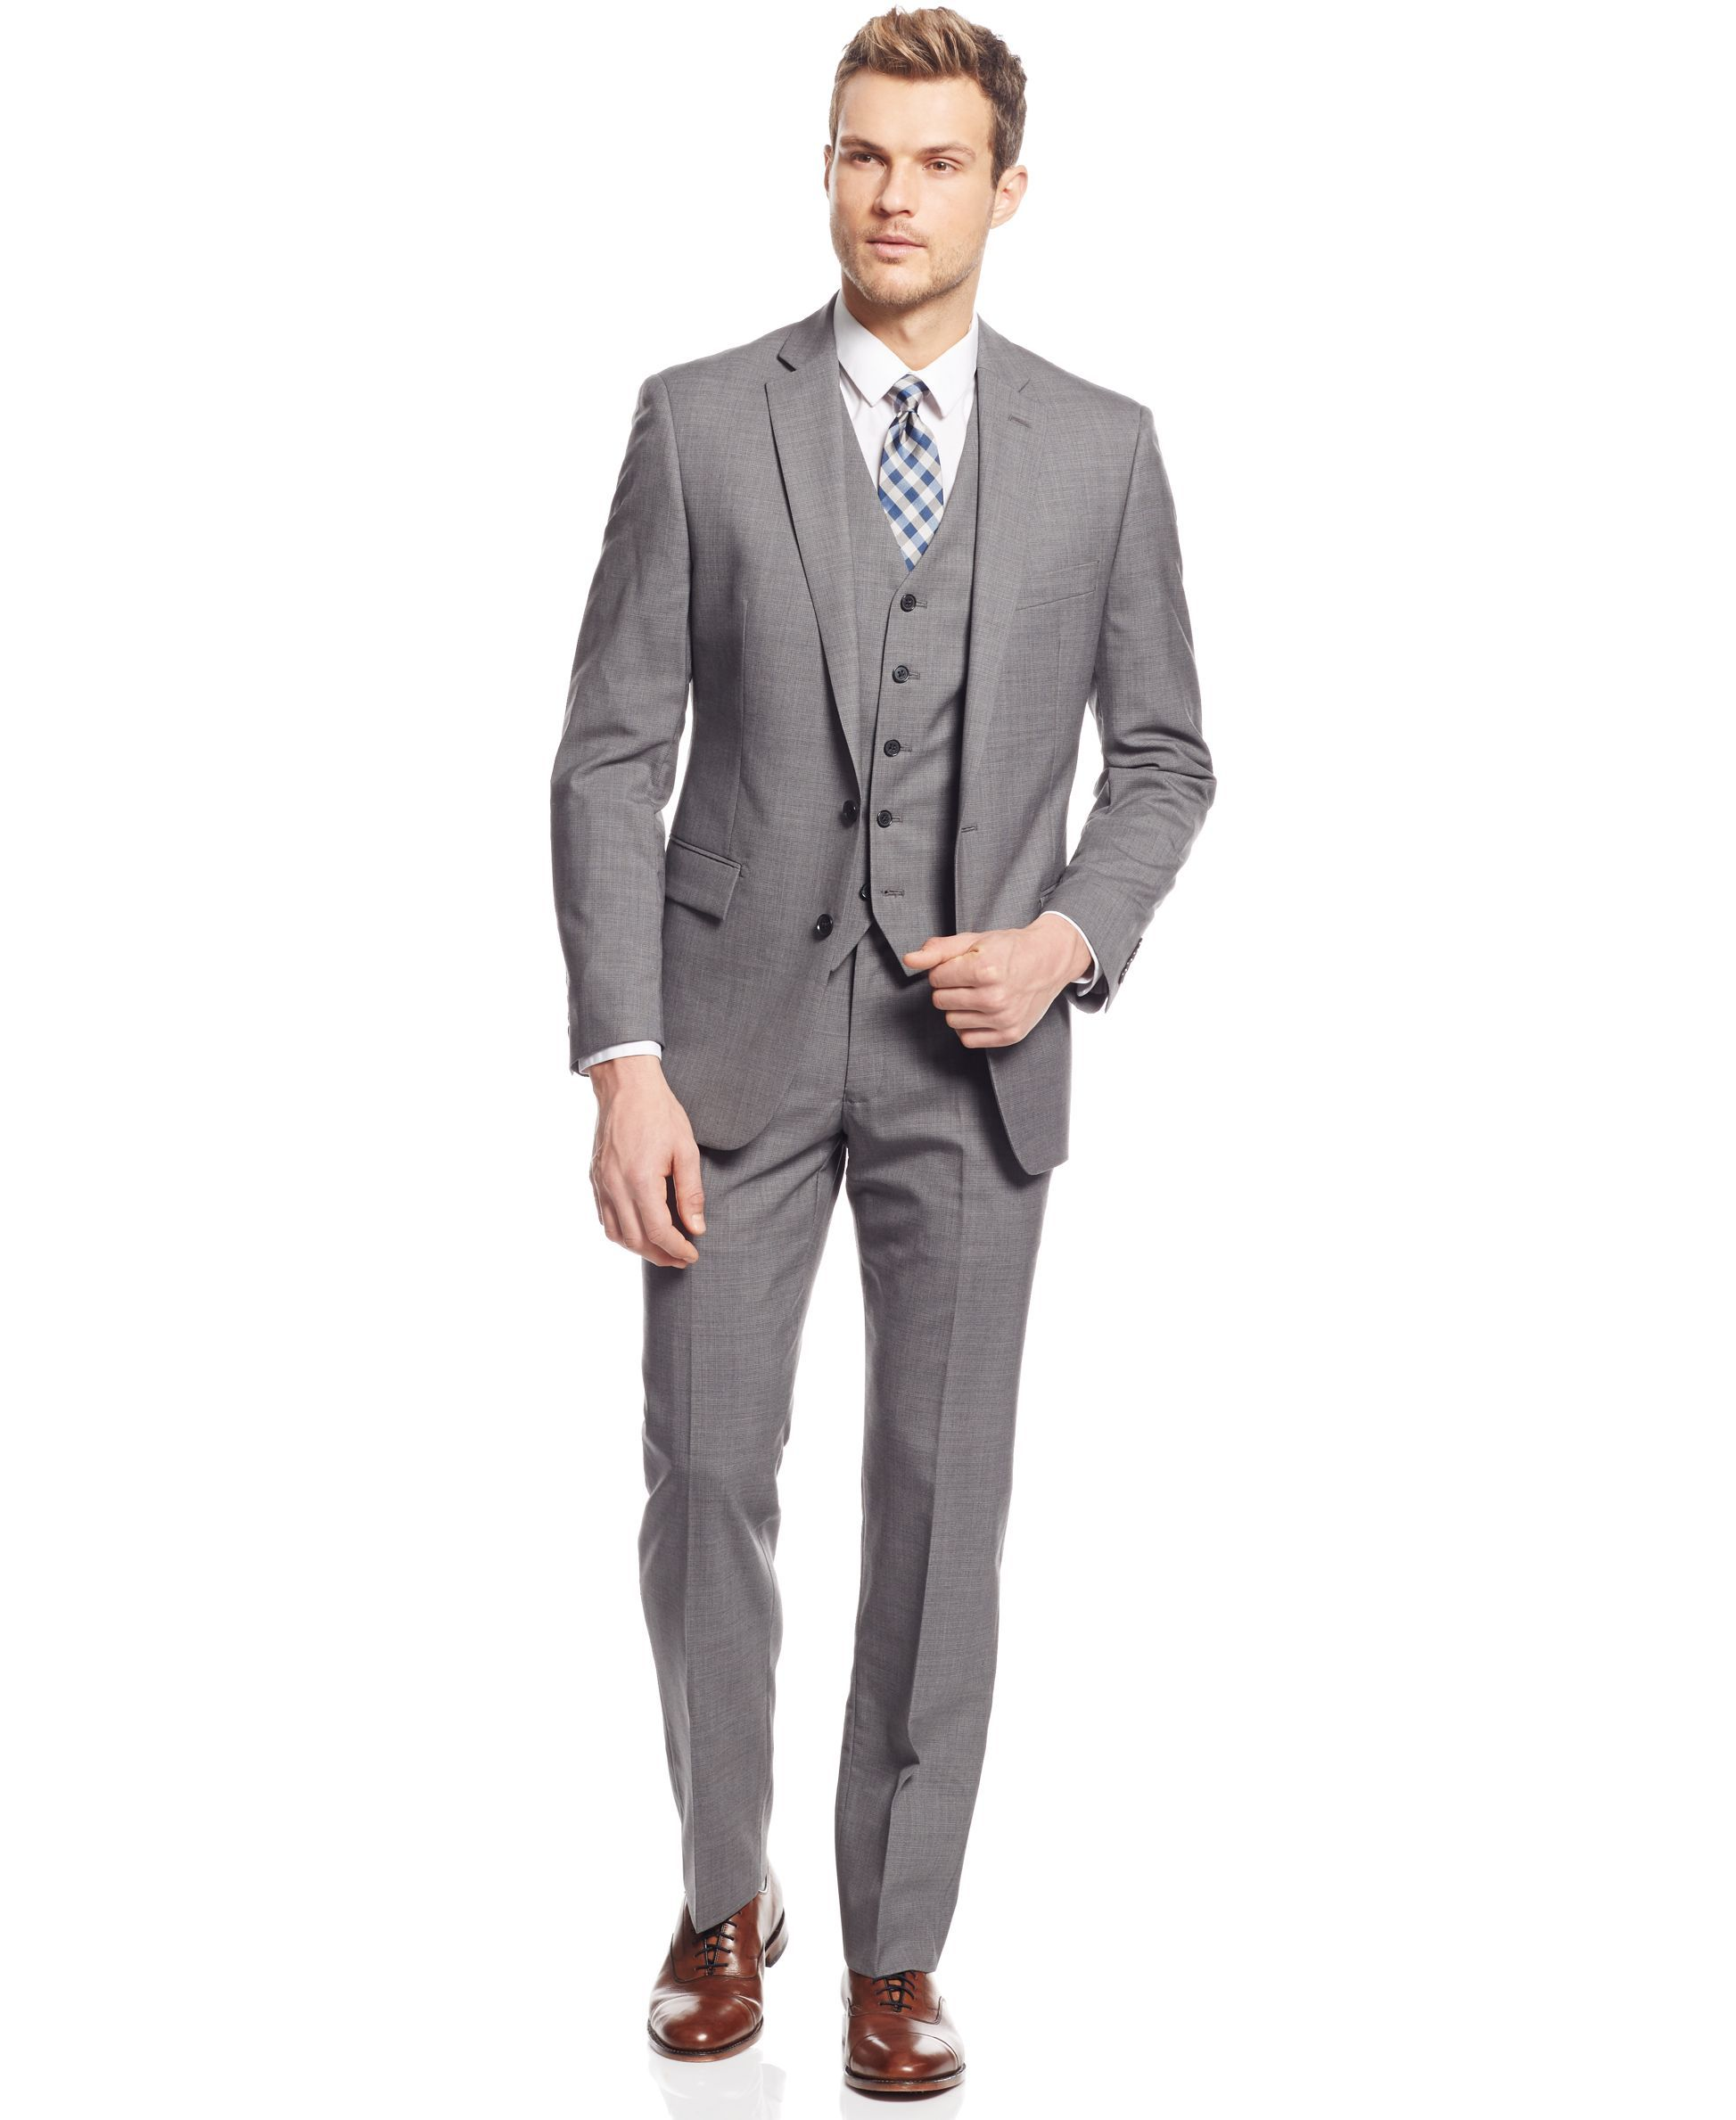 armoniia gray light suit bowtiesuspenders products suspenders